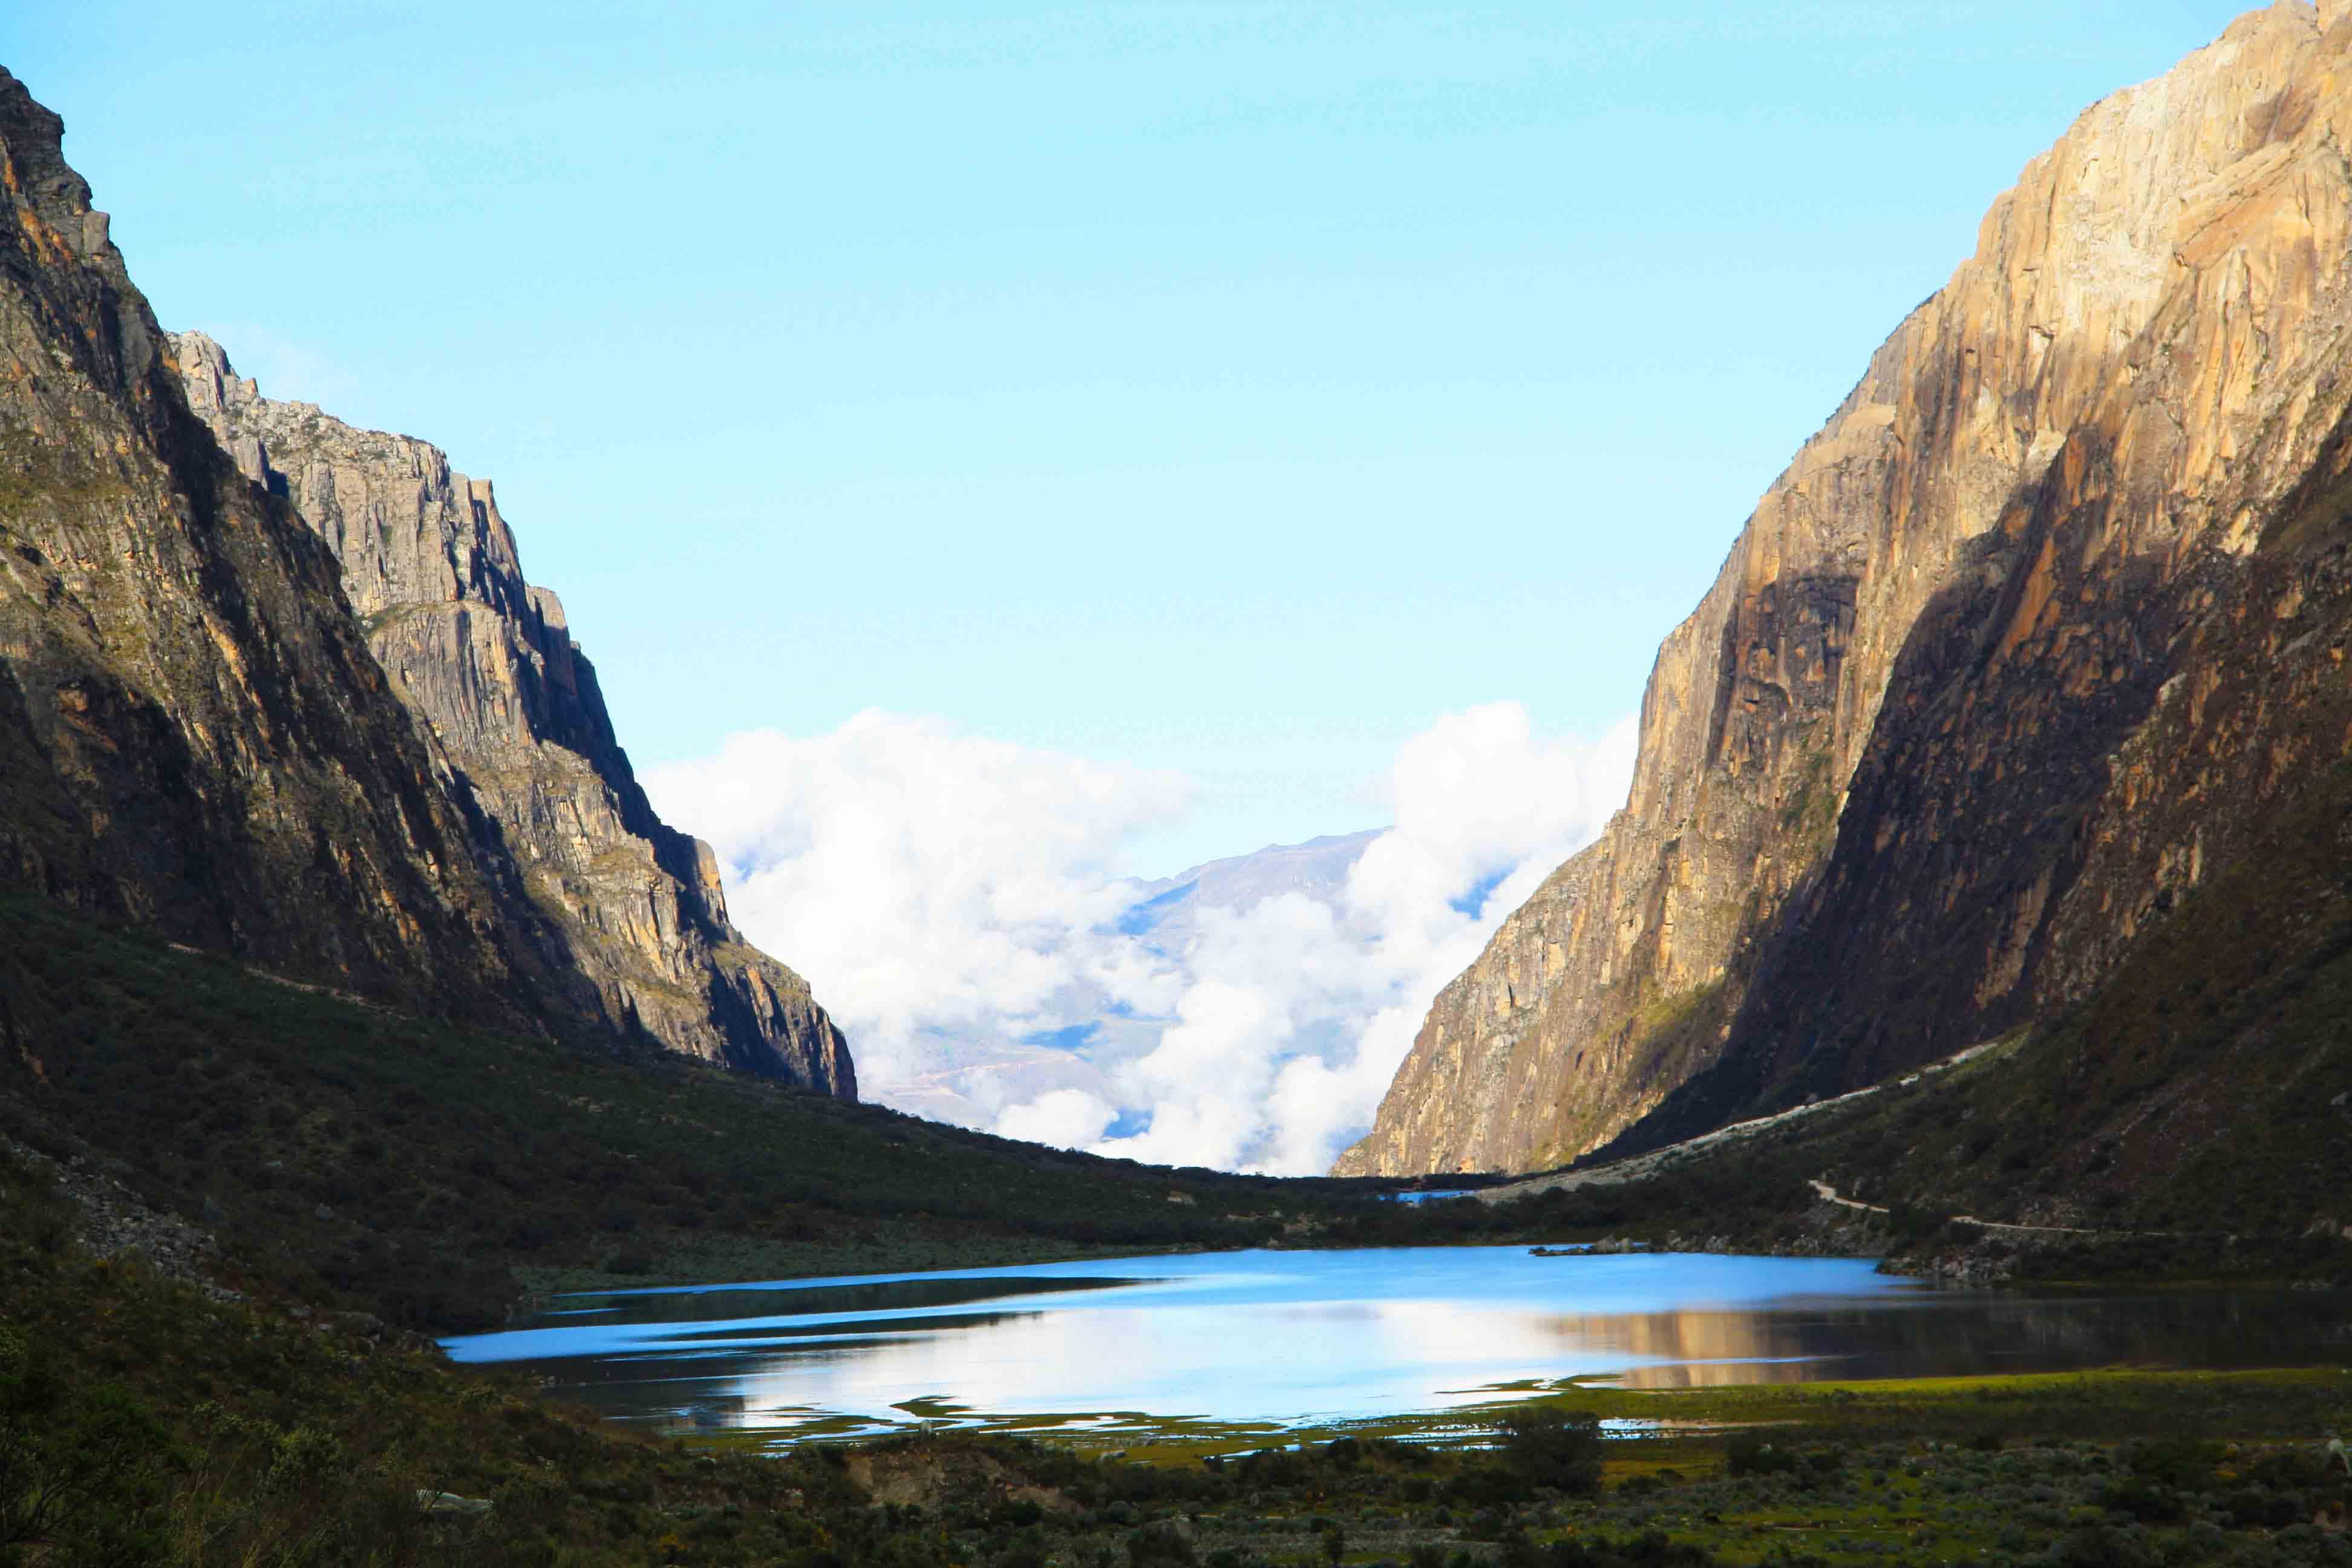 lake view of the cordillera blanca